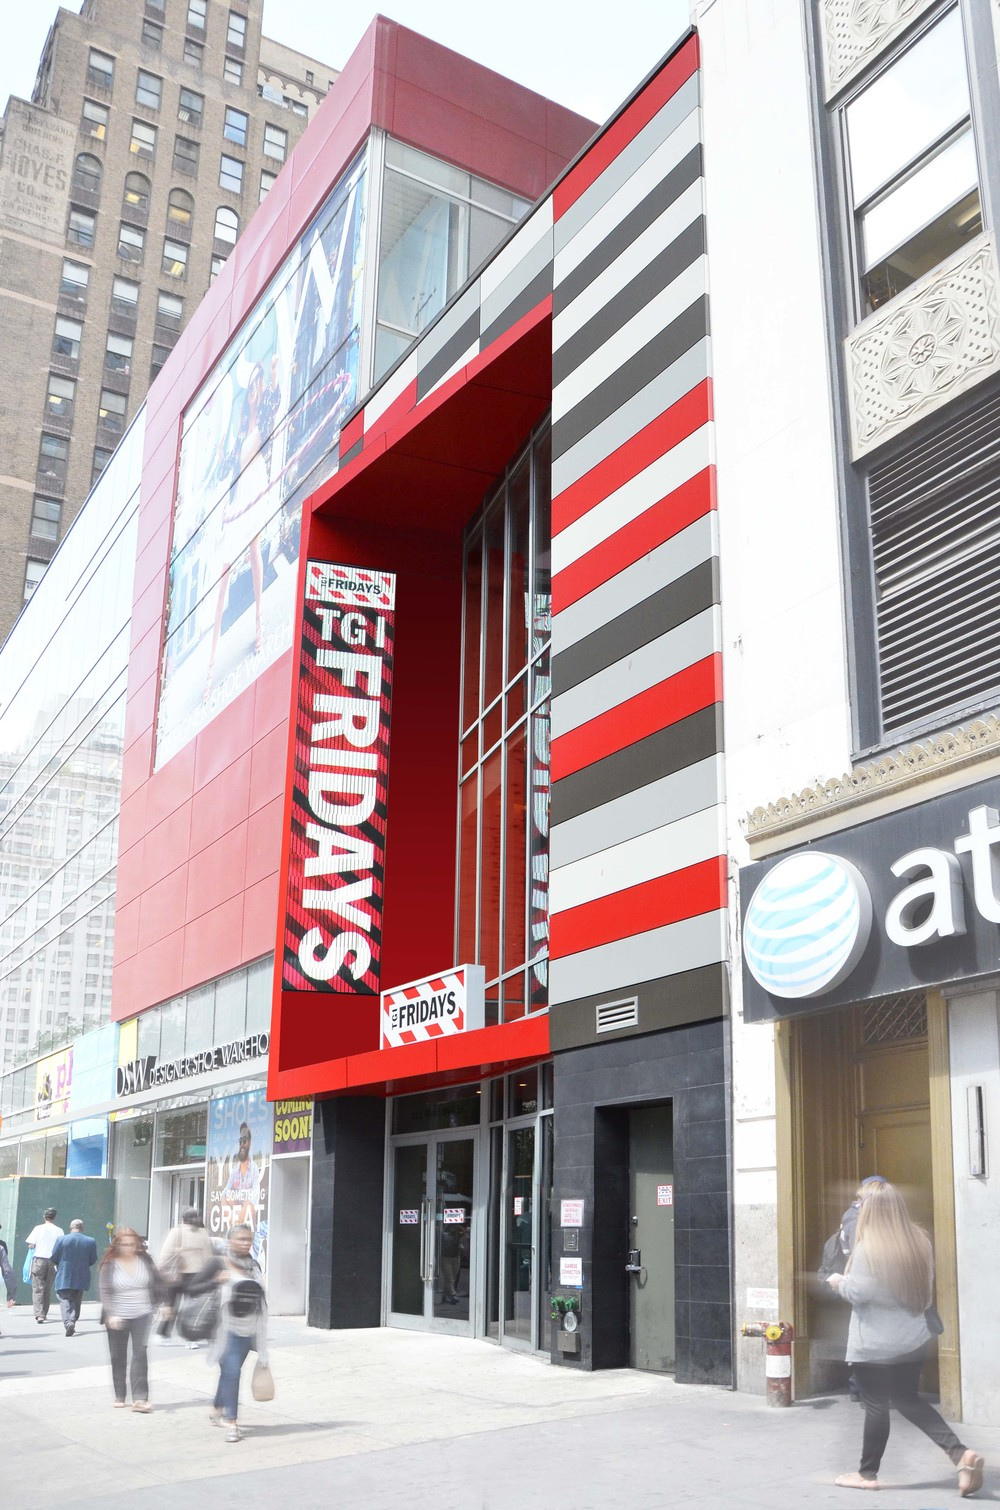 TGI Friday's. Tobin Parnes Design. NYC. Hospitality Design. Restaurant. Facade. Exterior. Storefront. Stripes